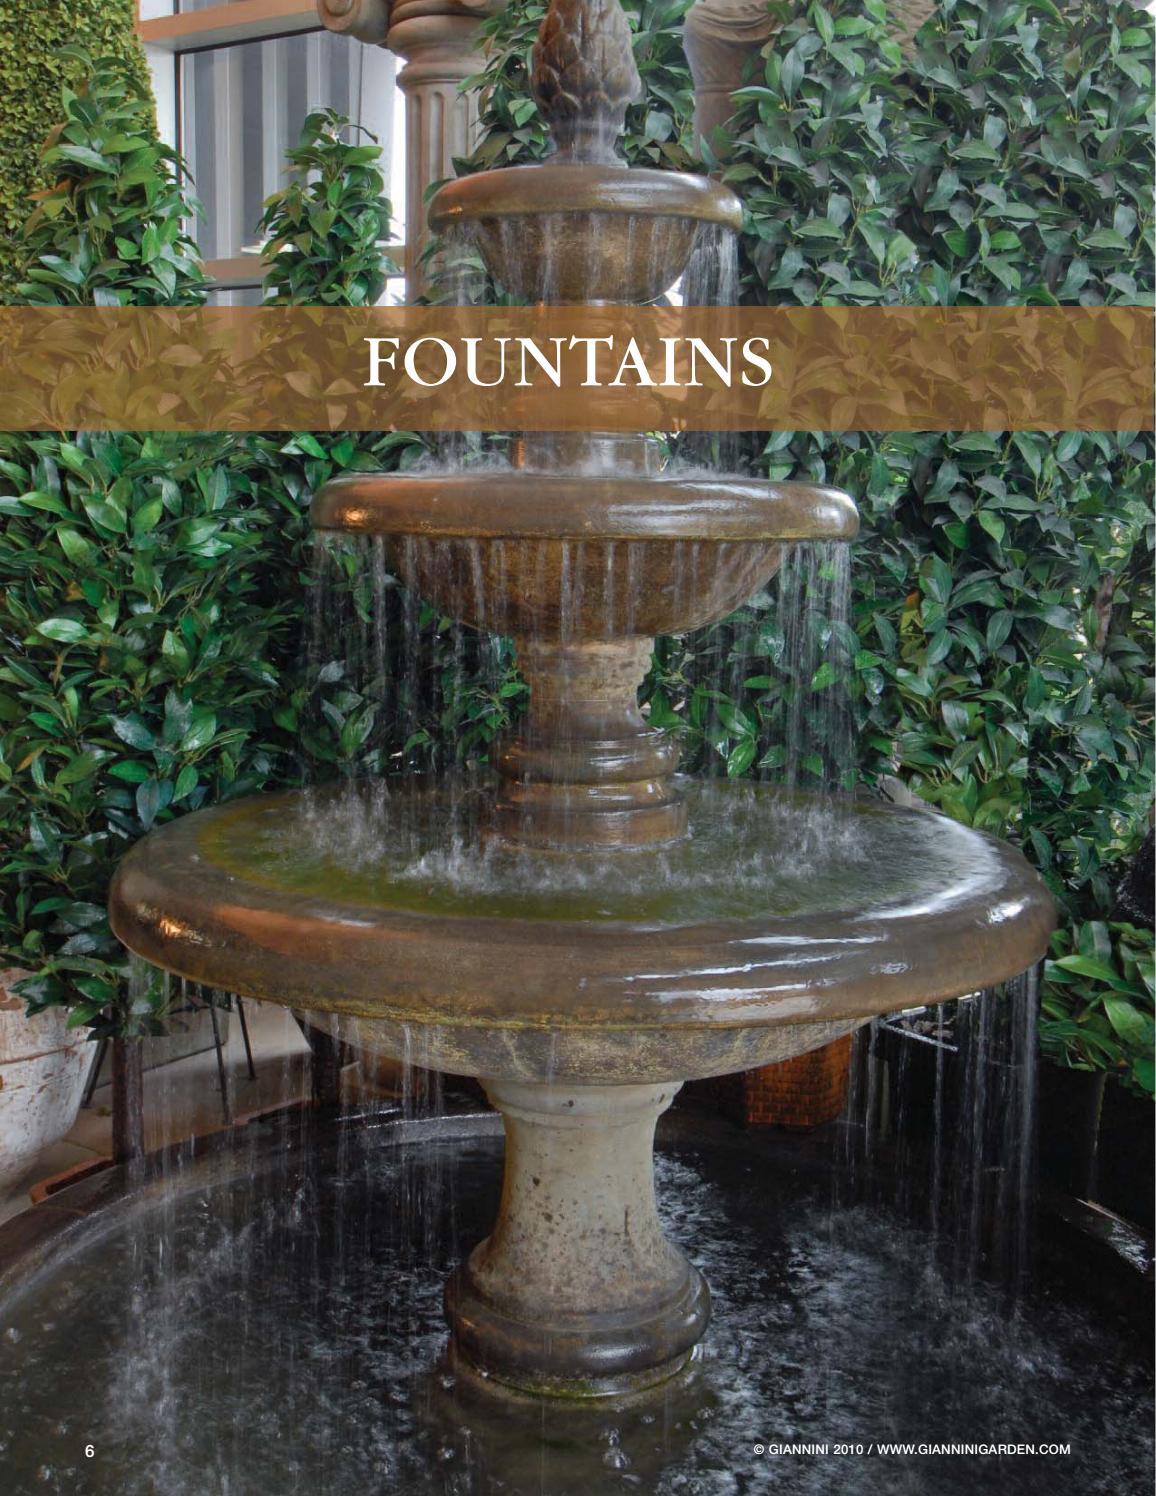 Giannini Garden Fountains By Giannini Garden Ornaments Issuu